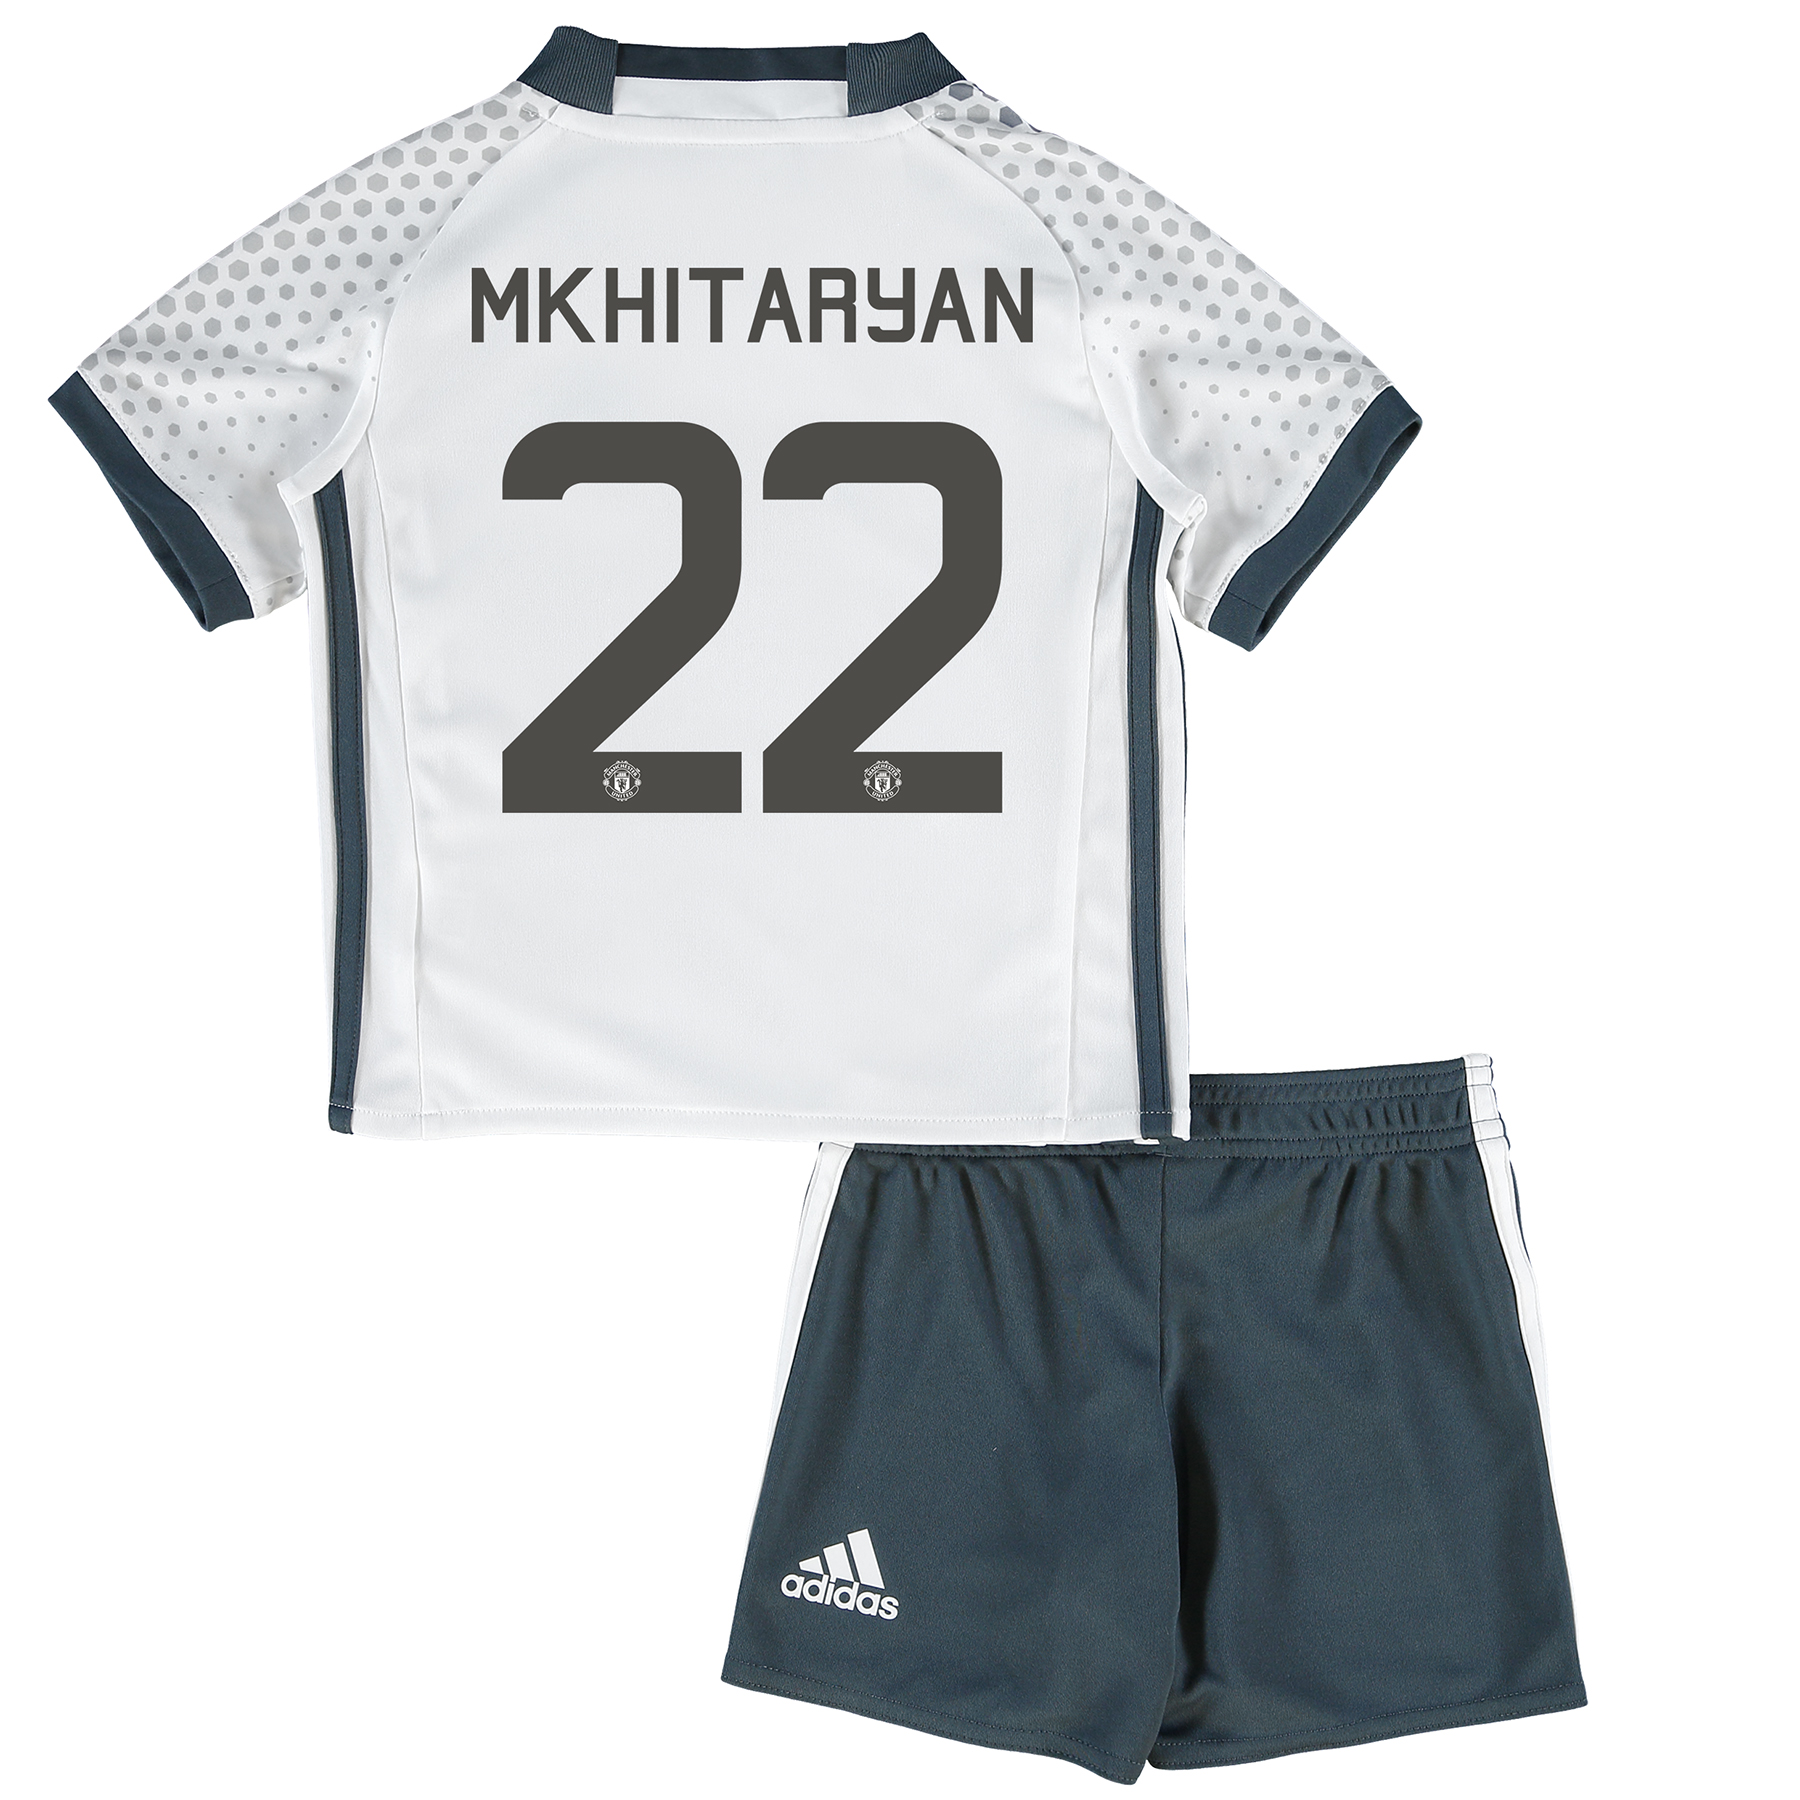 Manchester United Cup Third Mini Kit 2016-17 with Mkhitaryan 22 printi